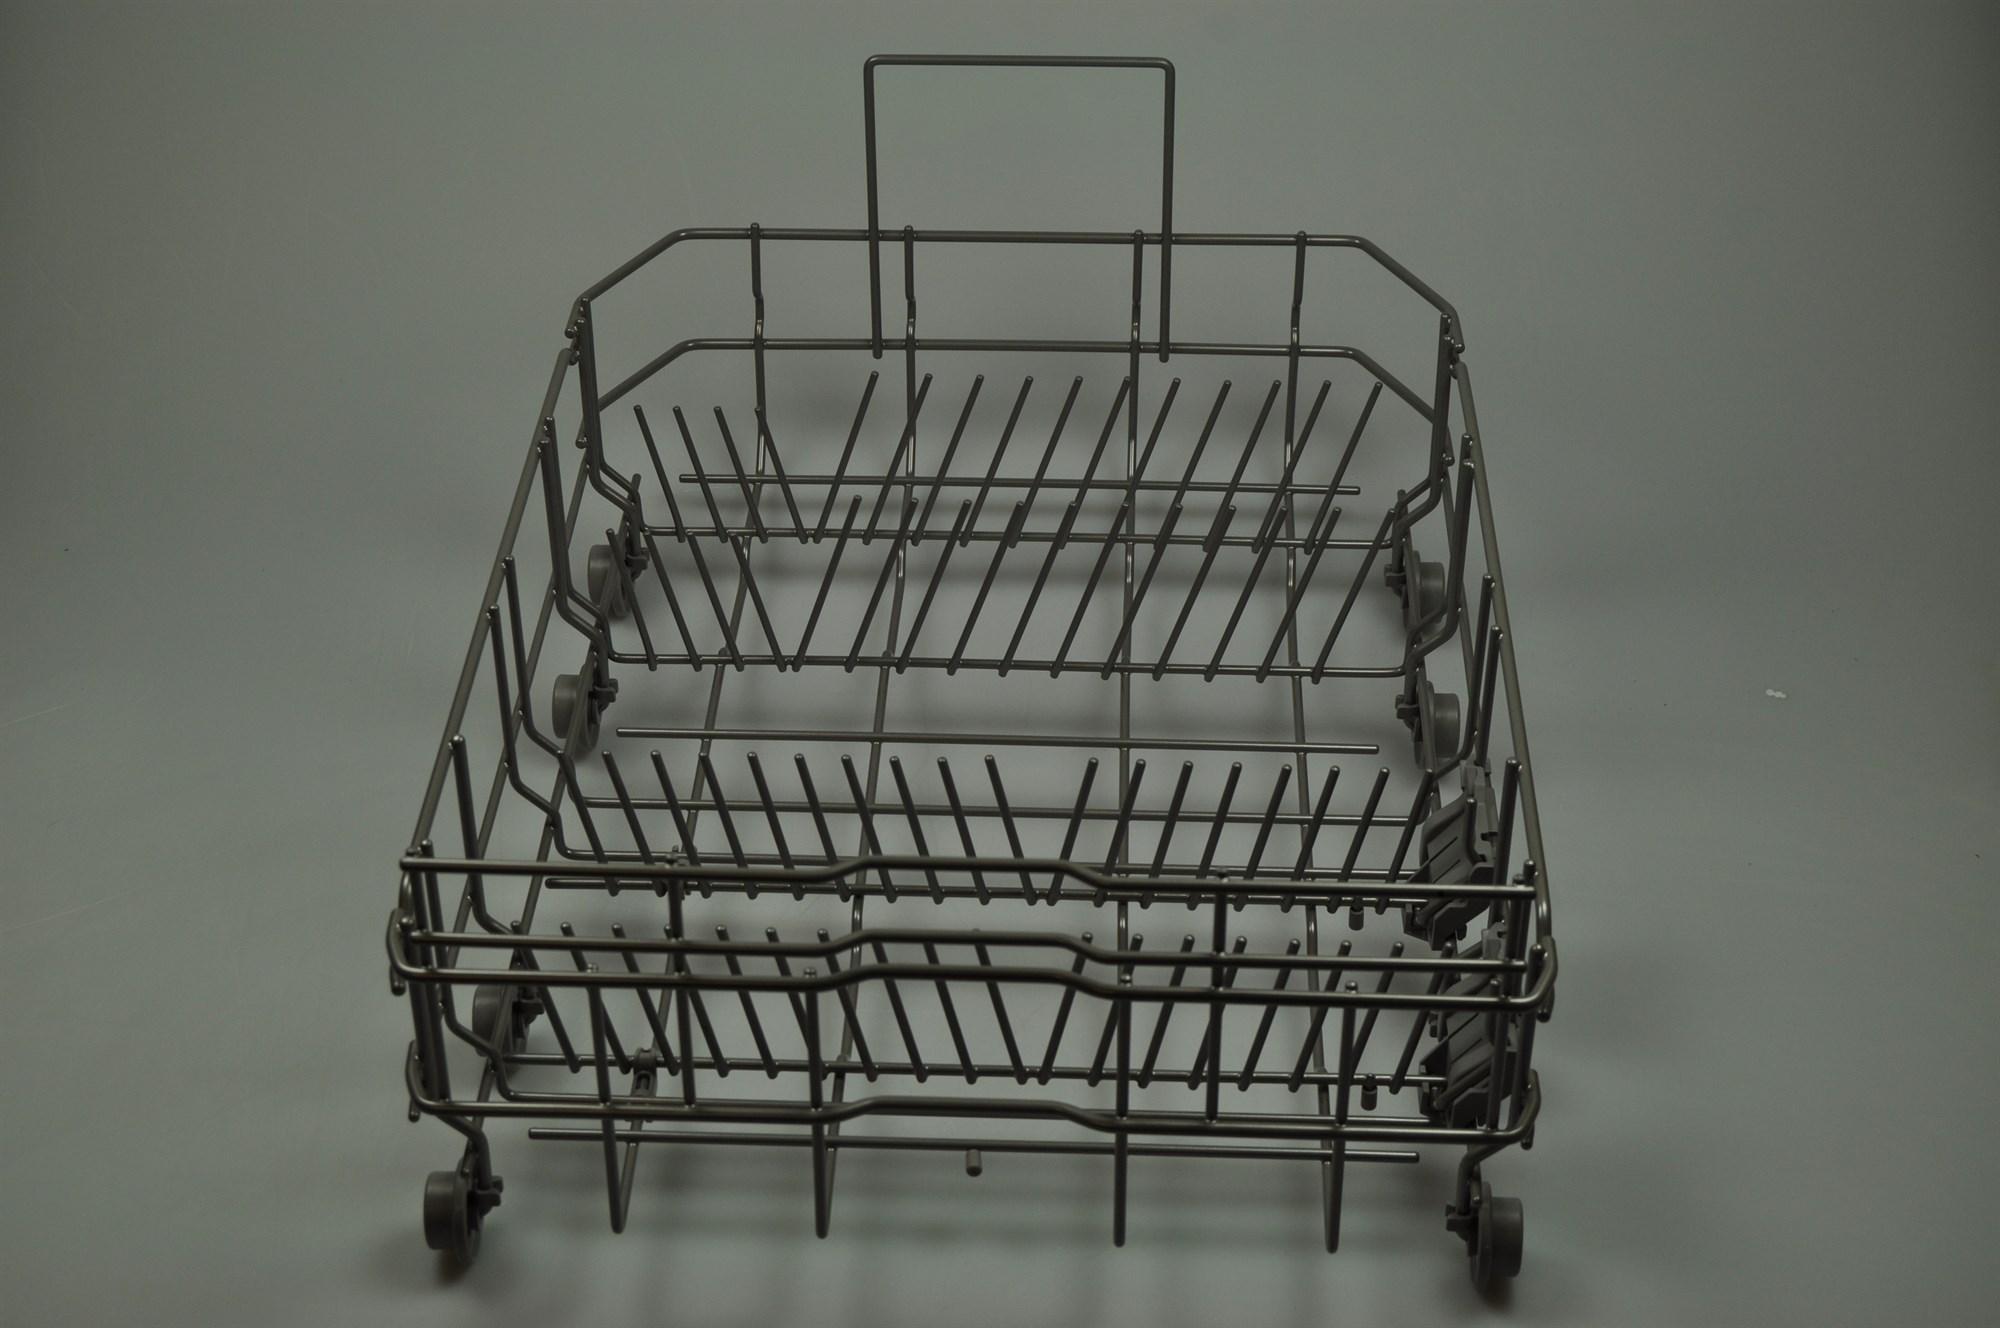 Basket Bosch Dishwasher